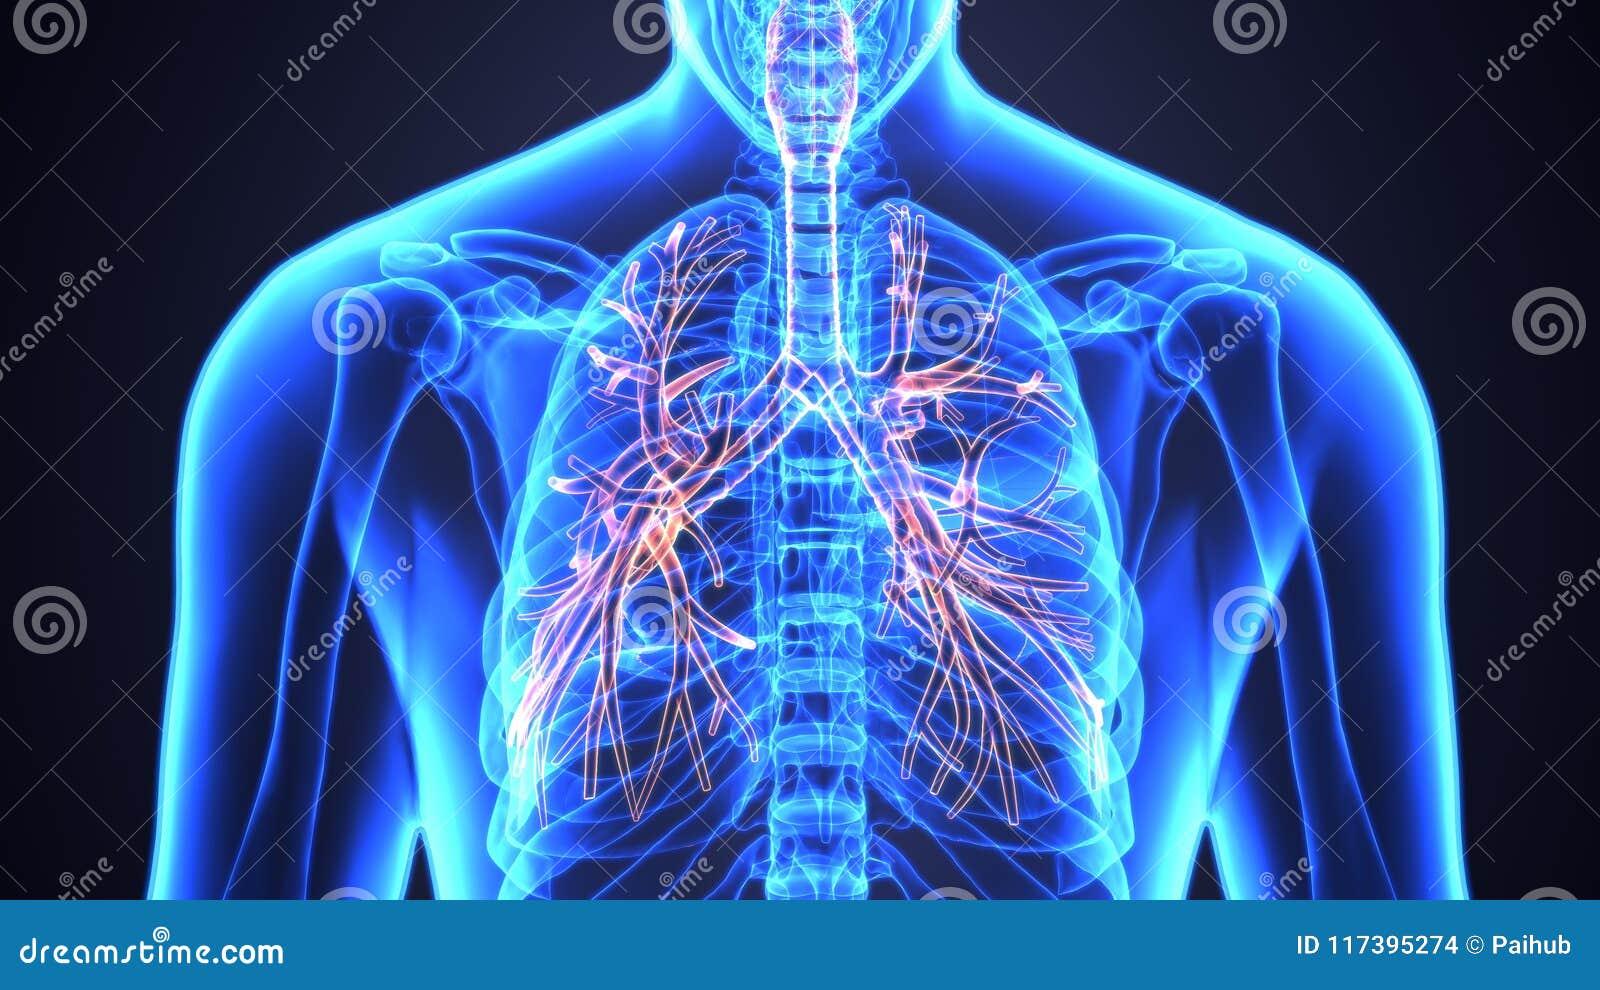 3d Illustration Of Human Lungs Inside Anatomy Larynx Trachea